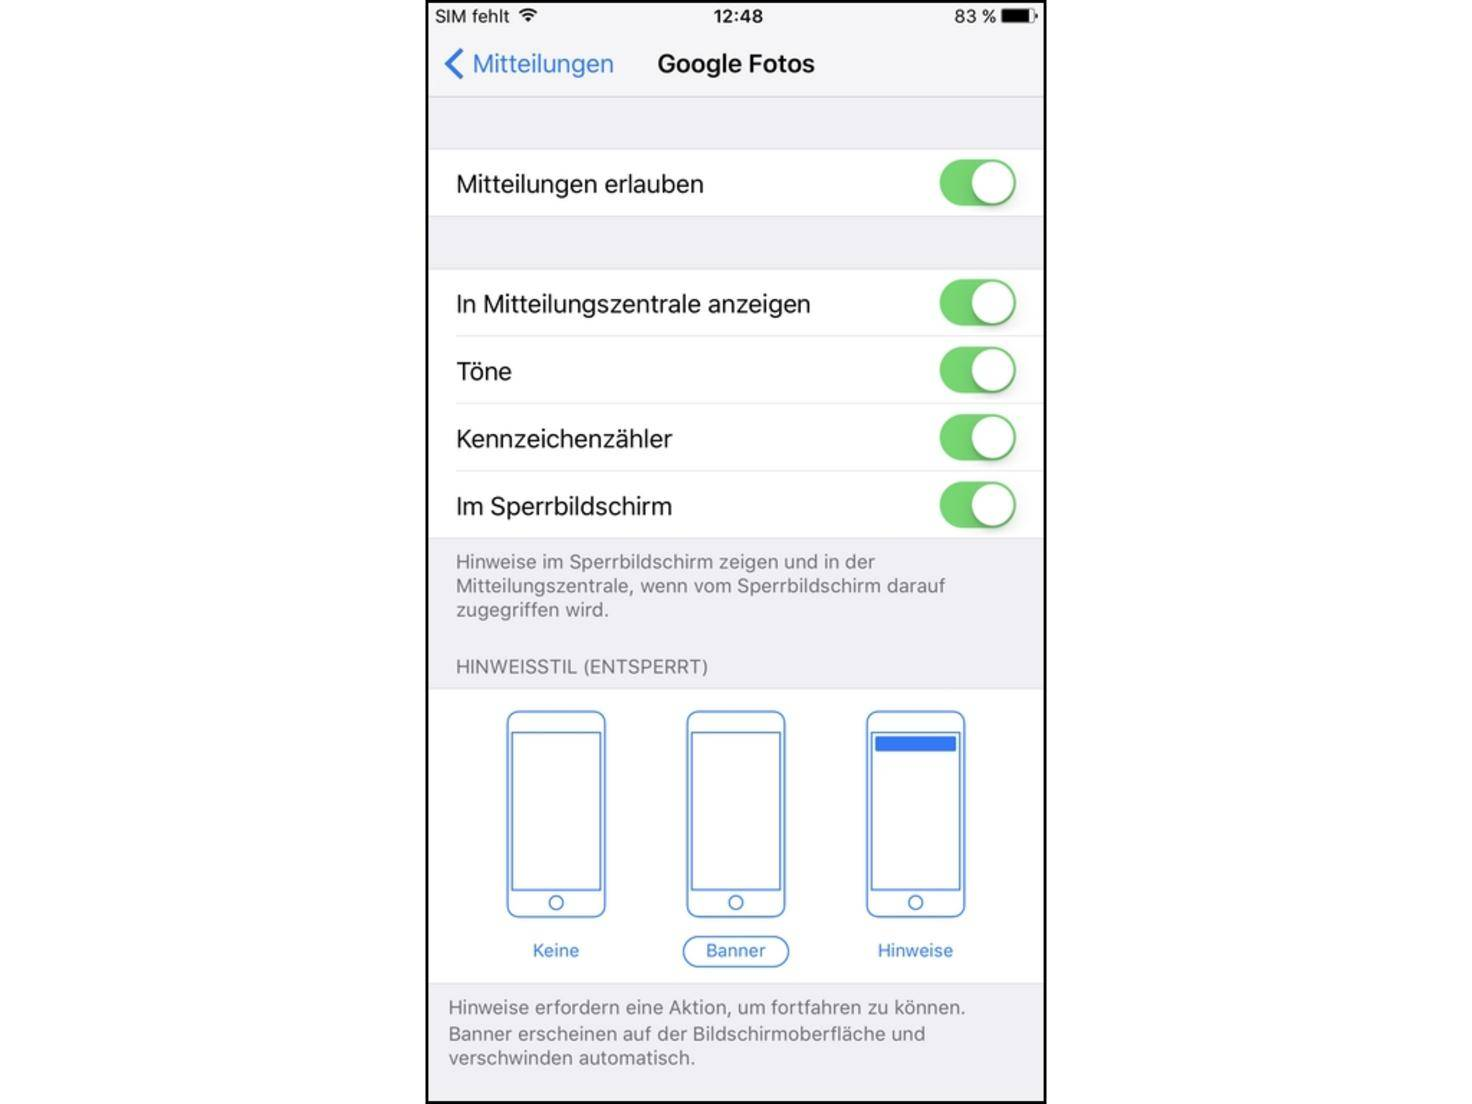 iPhone-Push-benachrichtigungen